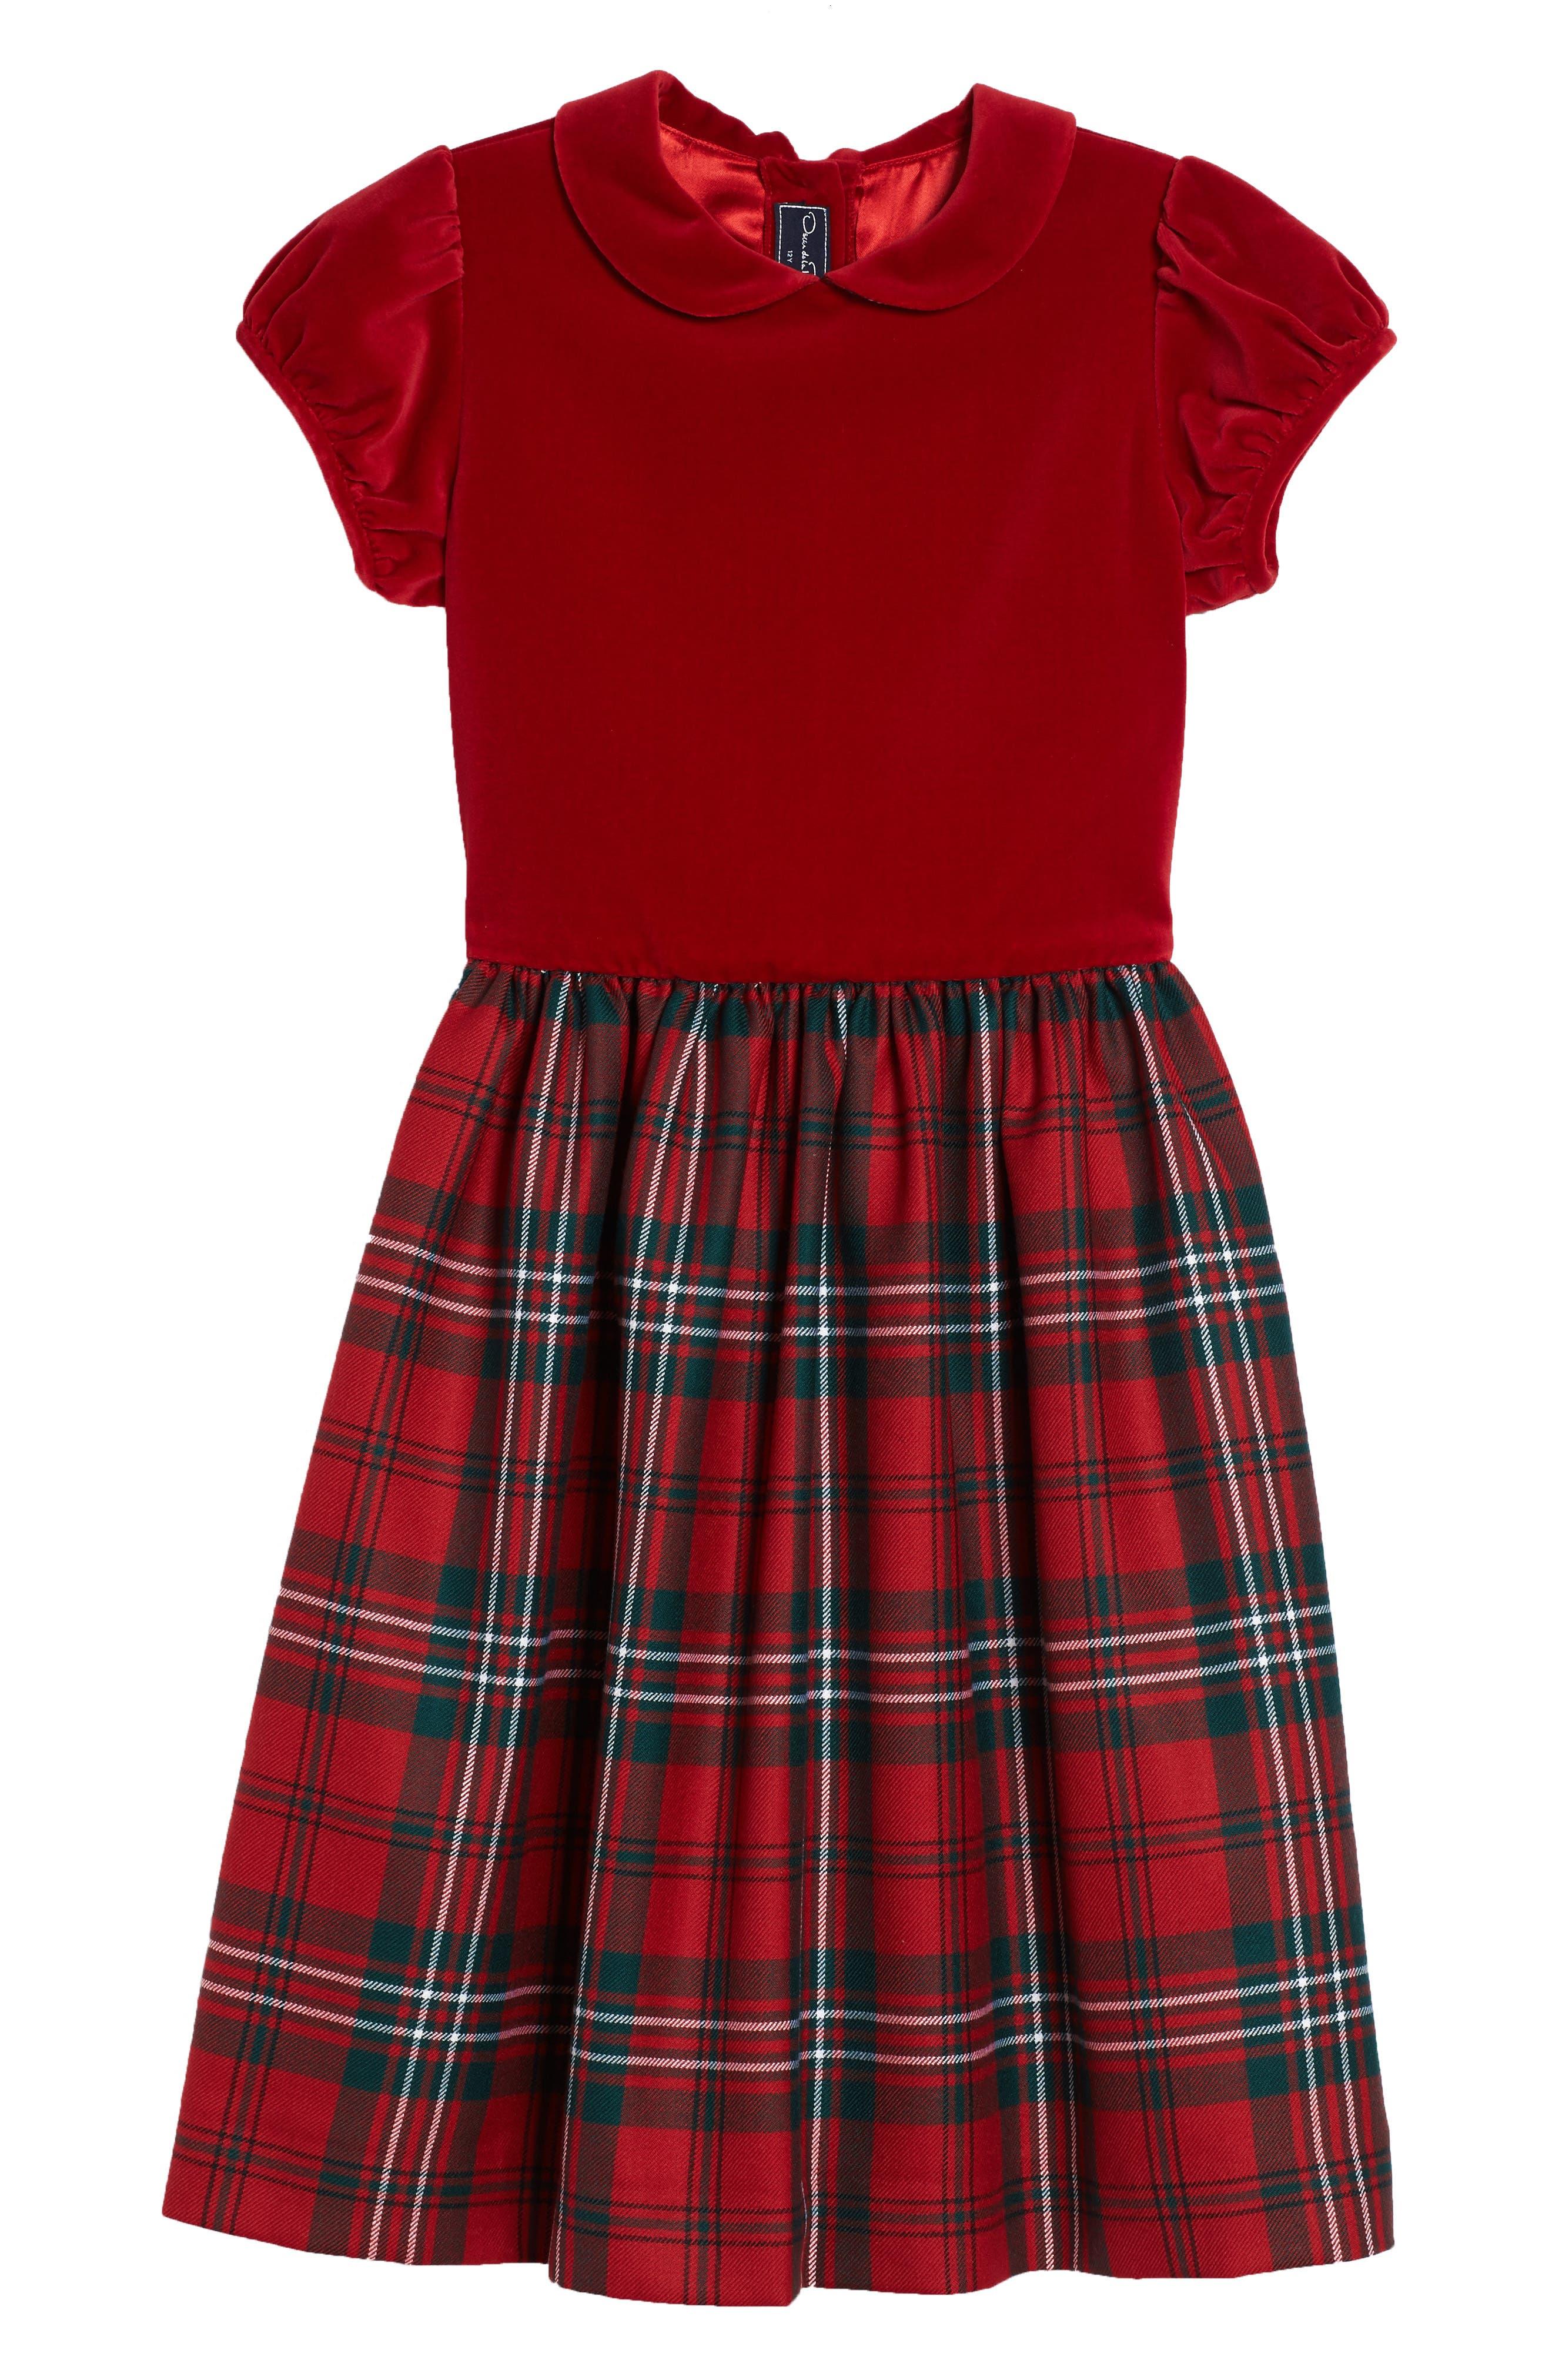 Oscar de la Renta Holiday Plaid Dress (Toddler Girls, Little Girls & Big Girls)